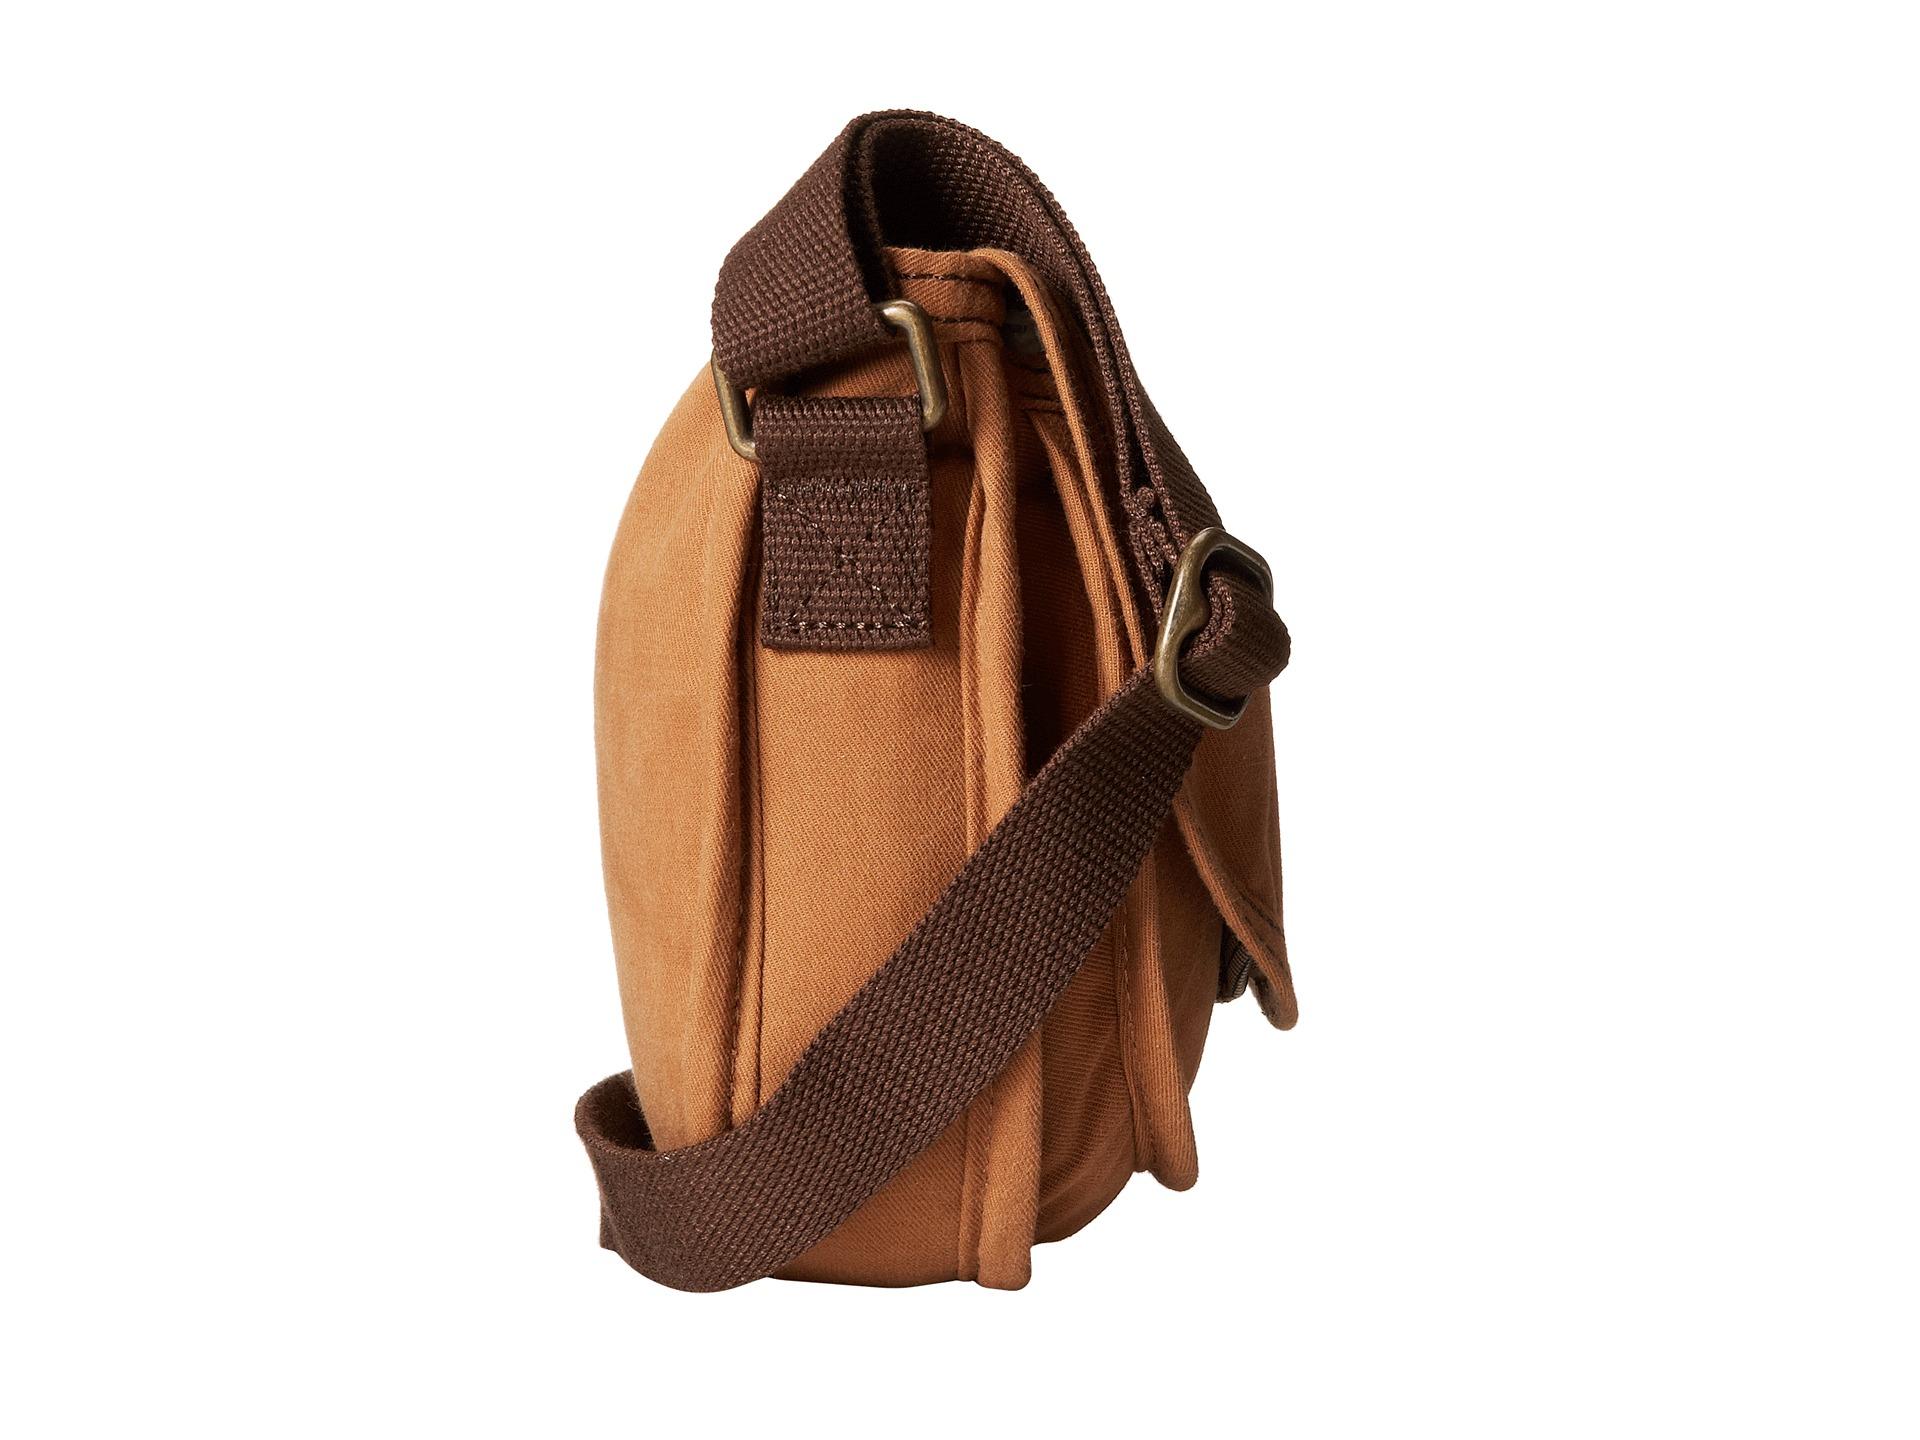 b16f9ca918 Lyst - Keen Montclair Mini Bag Brushed Twill in Brown